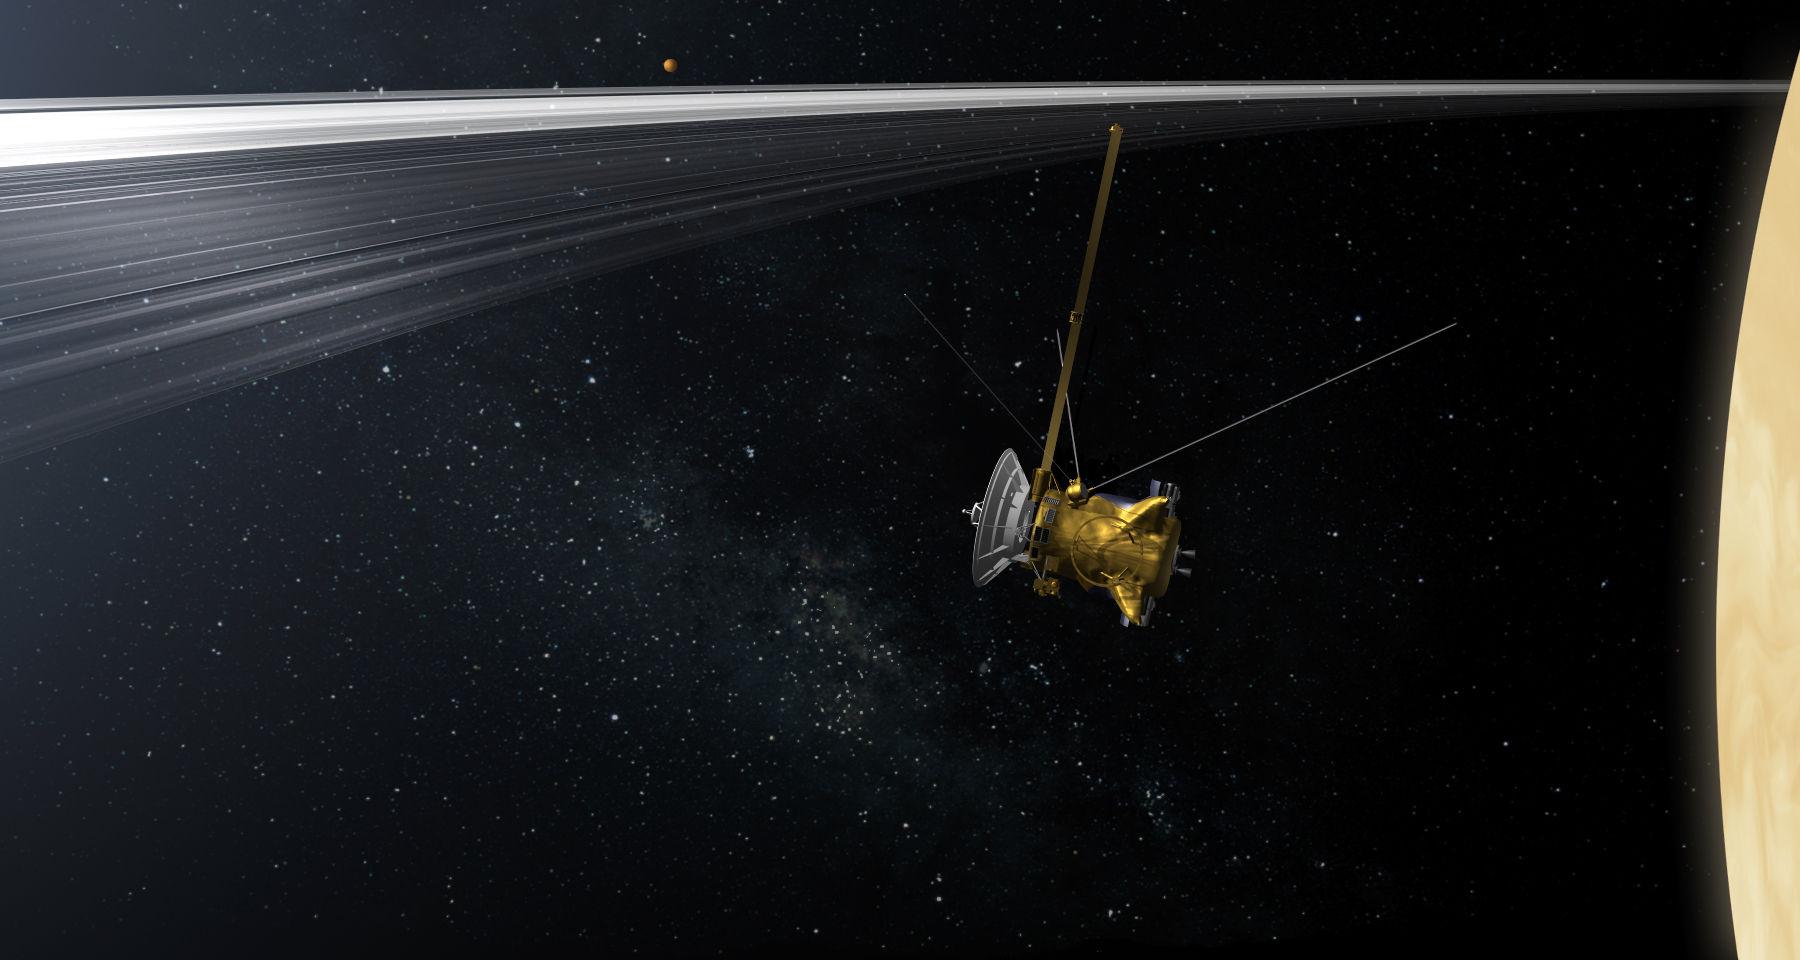 Foto por: NASA